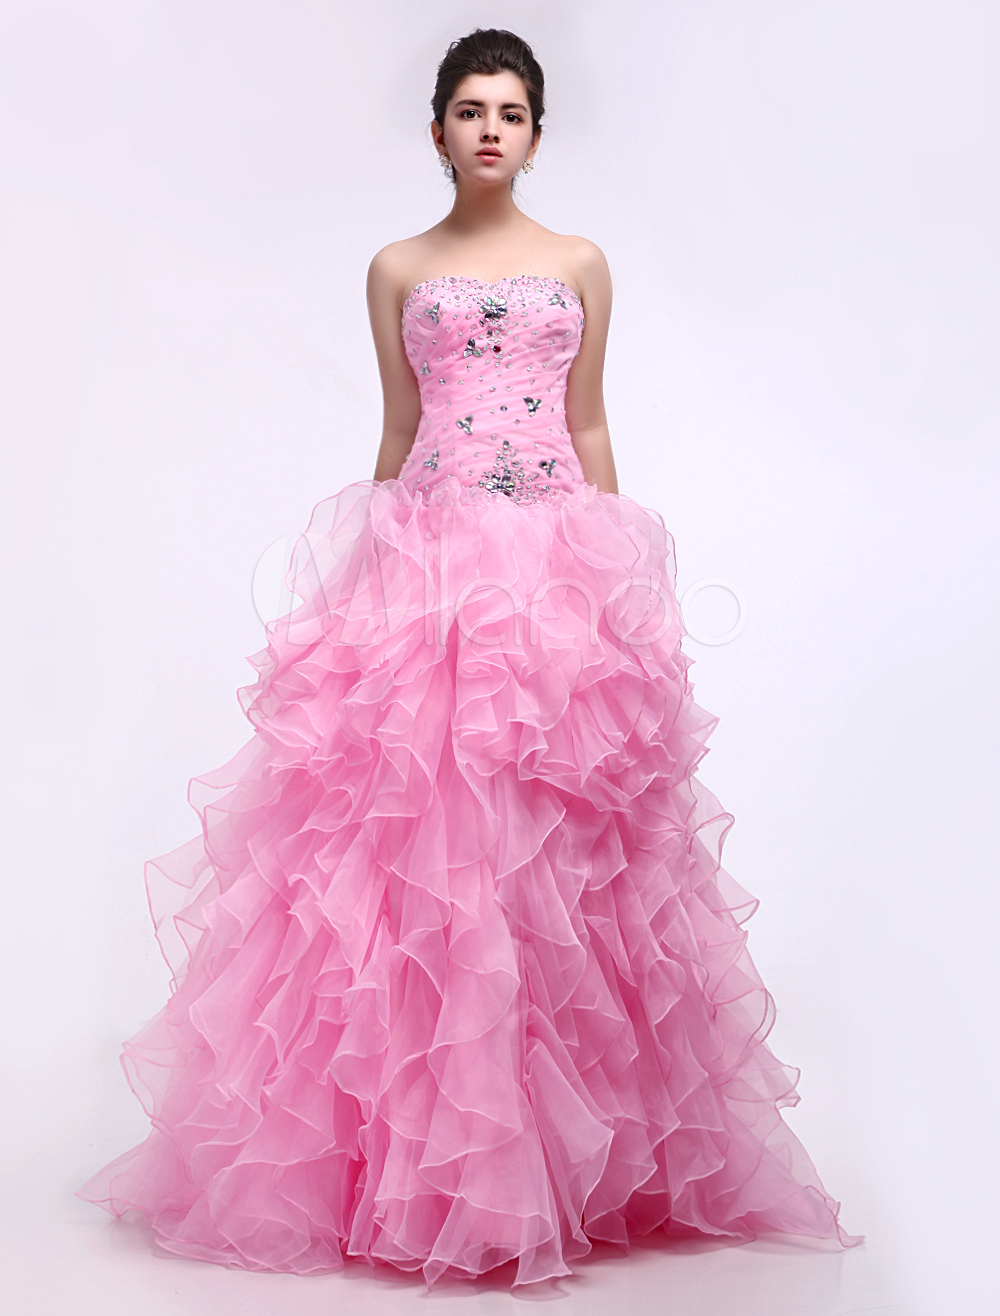 Elegant Pink Satin Organza Sweetheart Women's Ball Gown